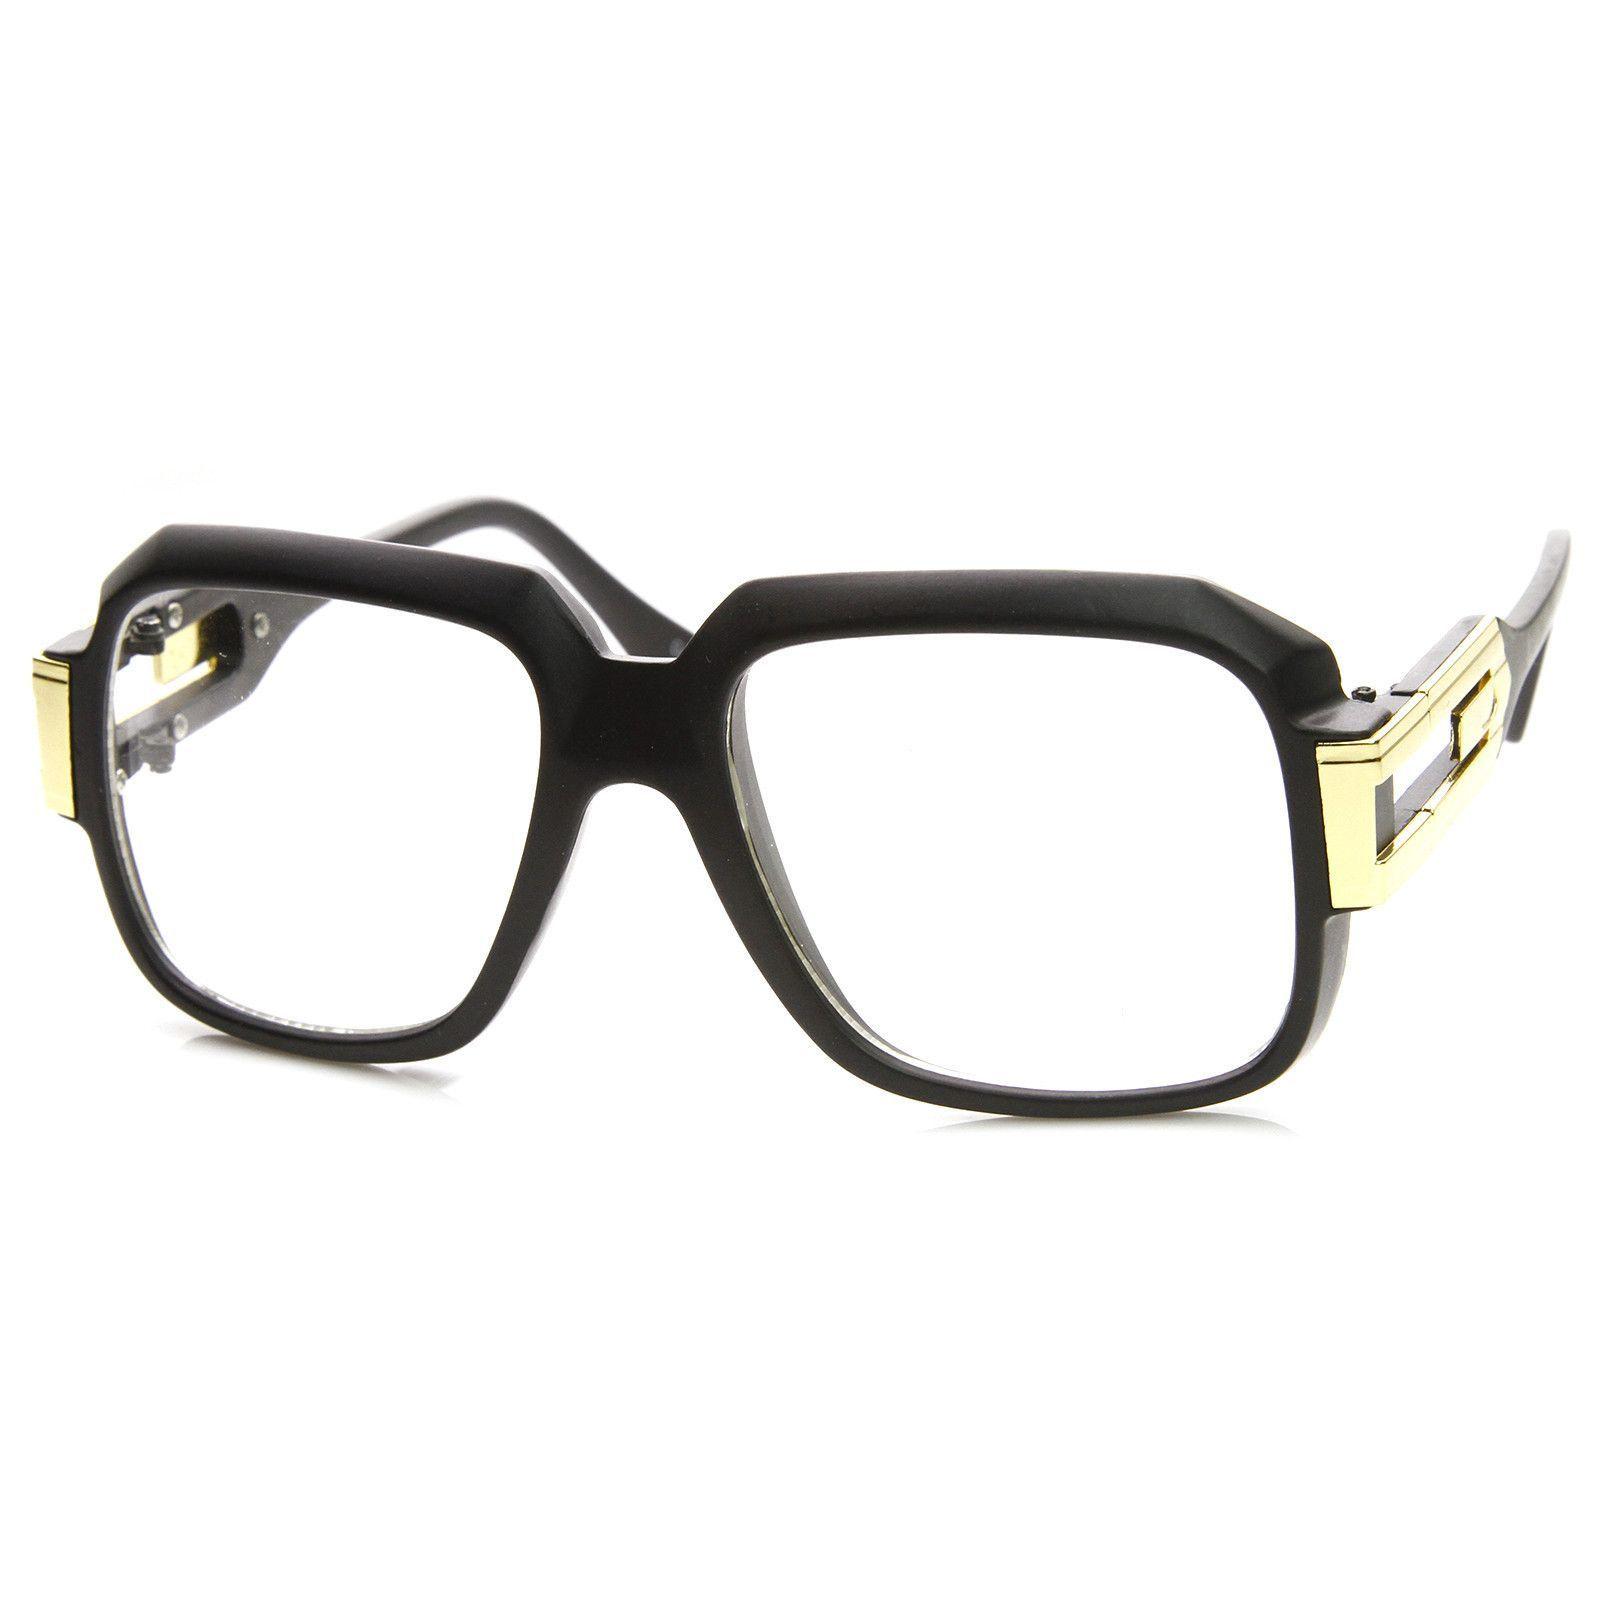 c4b0f7cec31f3 Retro Euro Square Hip Hop 80 s Fashion Clear Lens Glasses 8901 ...